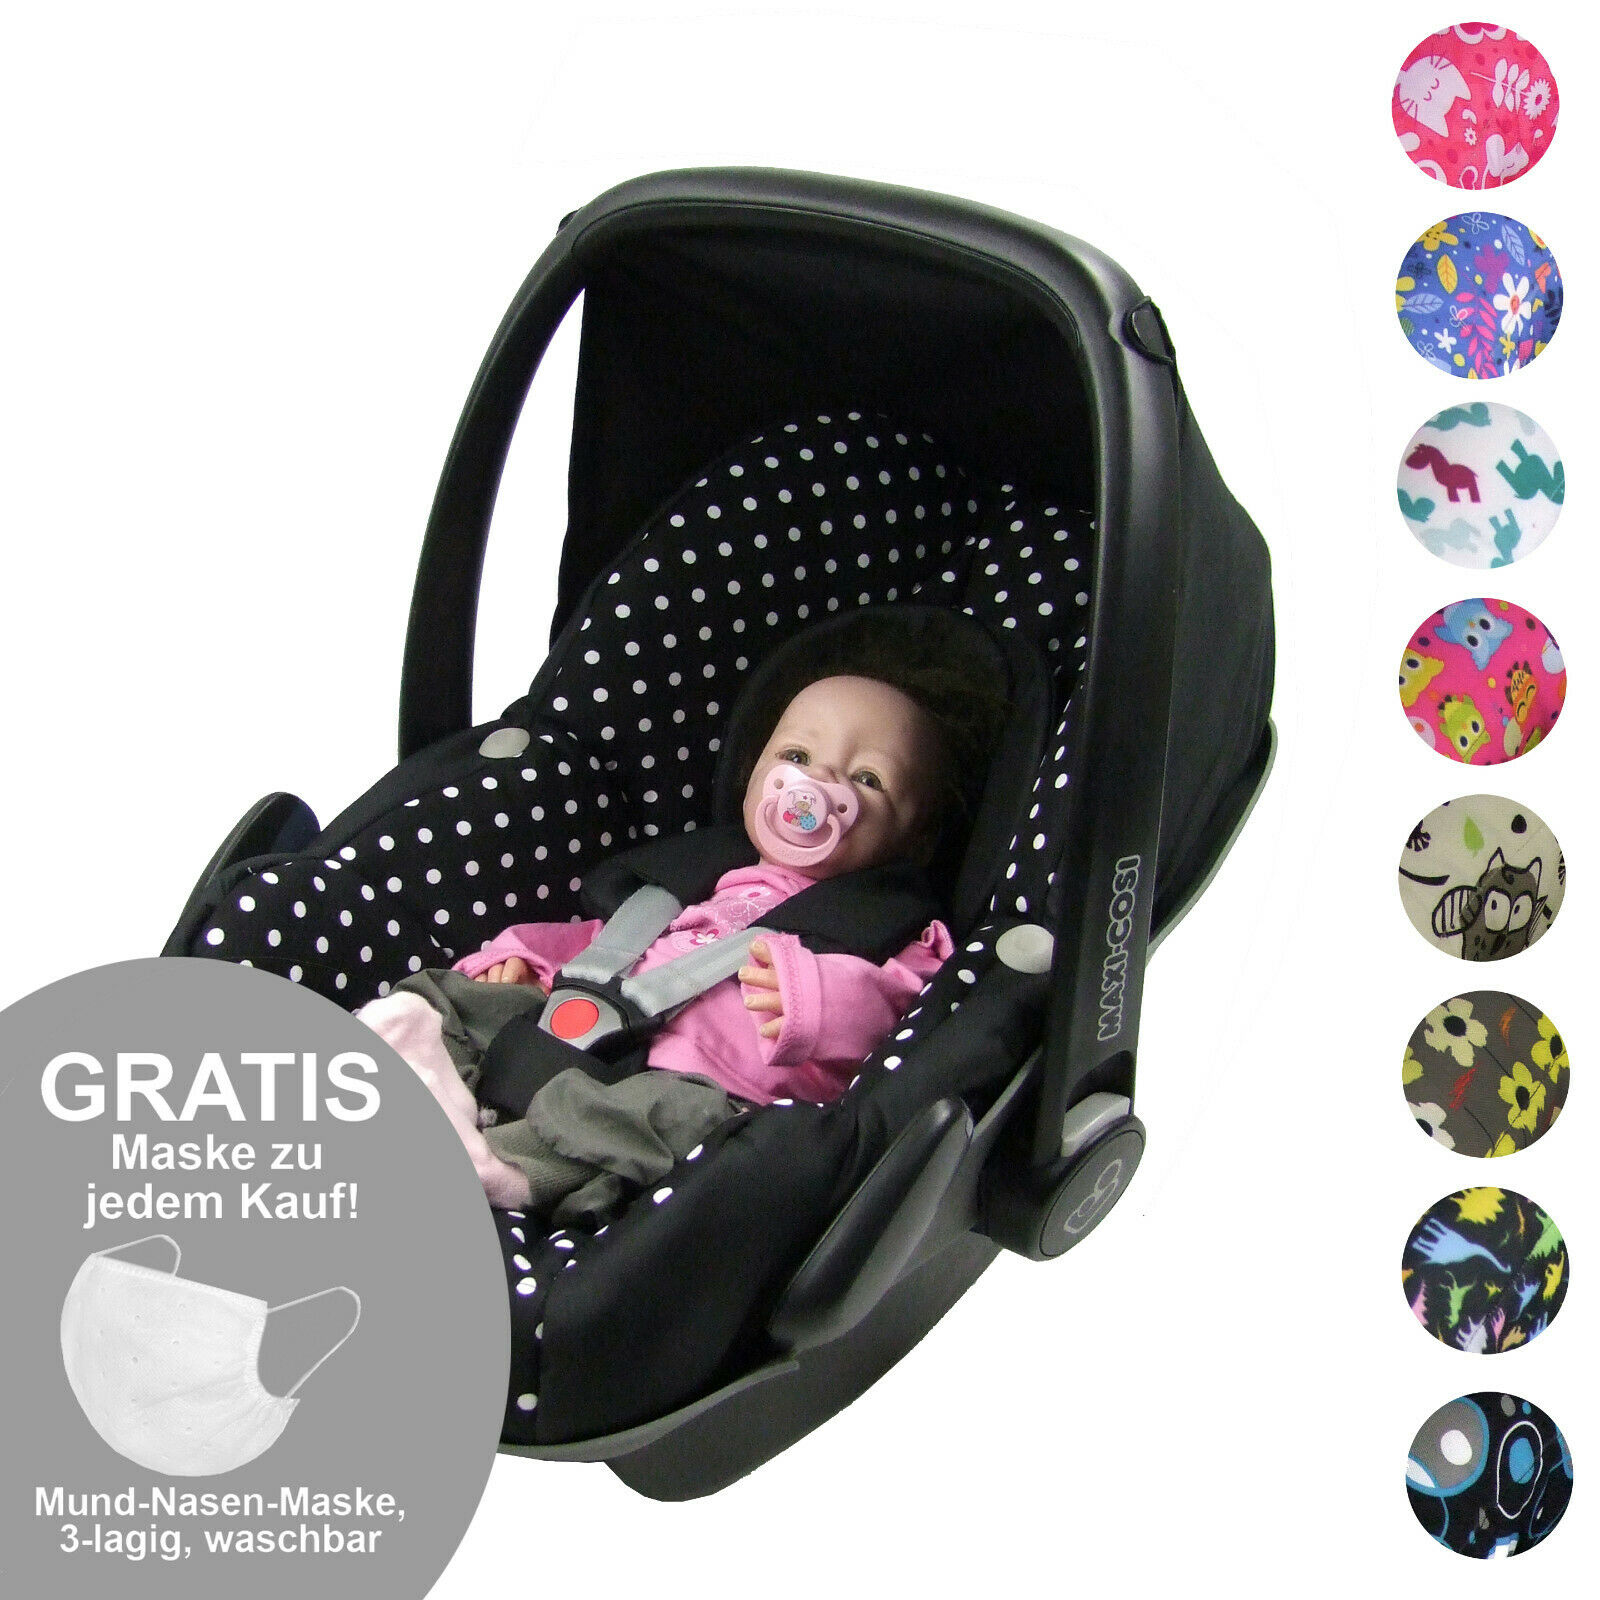 BAMBINIWELT Ersatzbezug Bezug Set für Babyschale von Maxi-Cosi PEBBLE XX